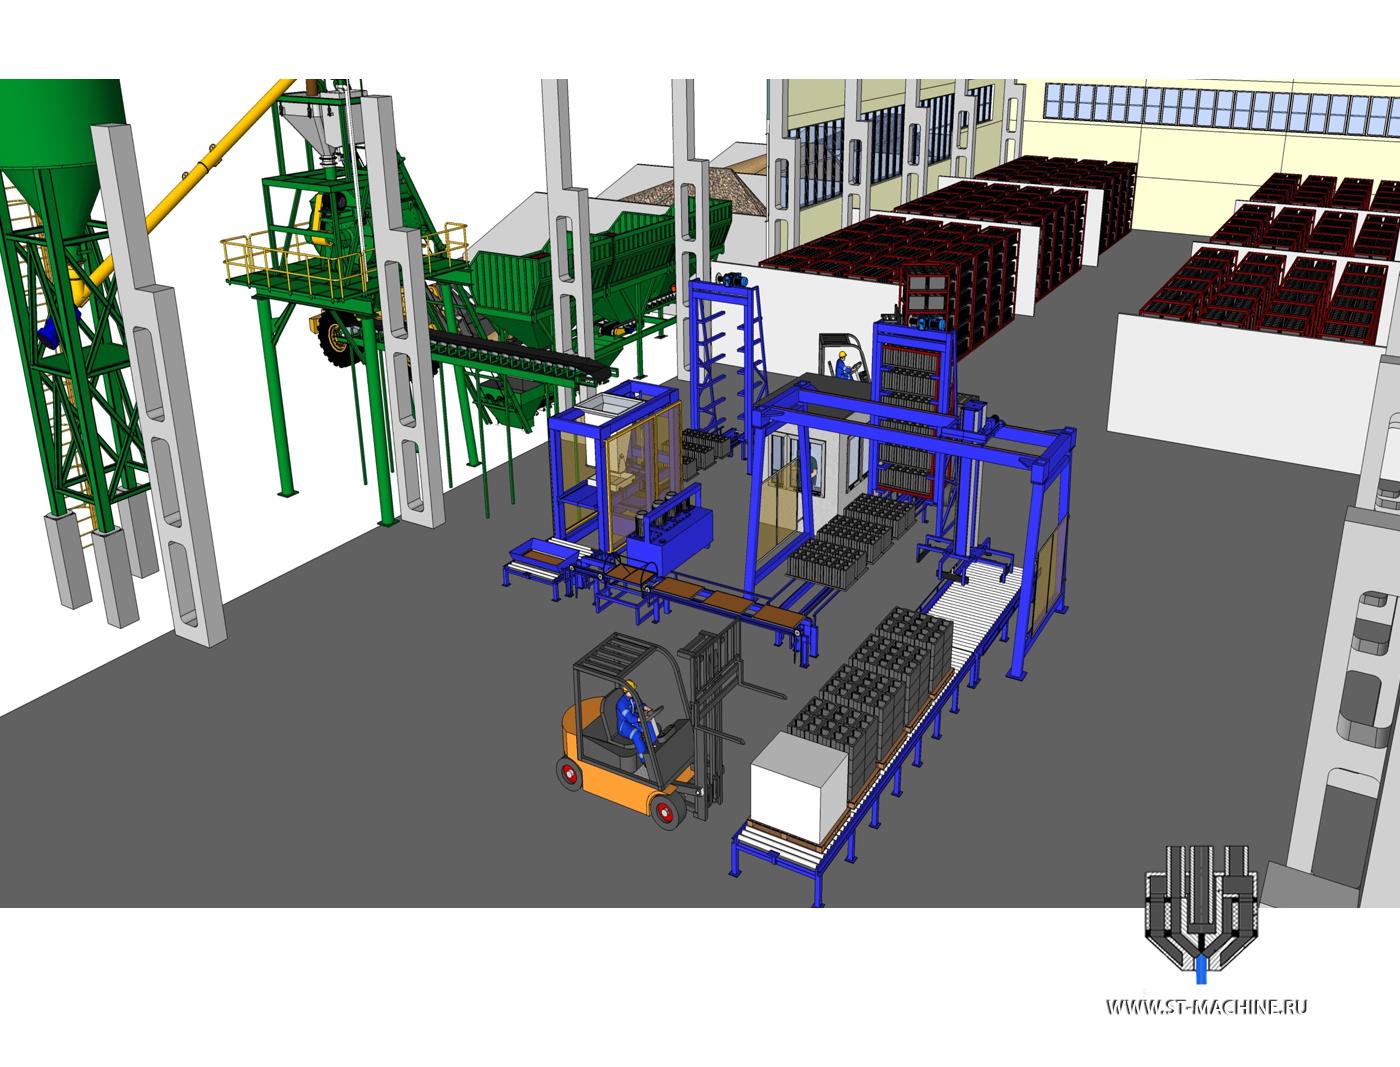 tehnolog-linii-vibropress-proekt-st-machine.ru-betonnui-zavod.jpg